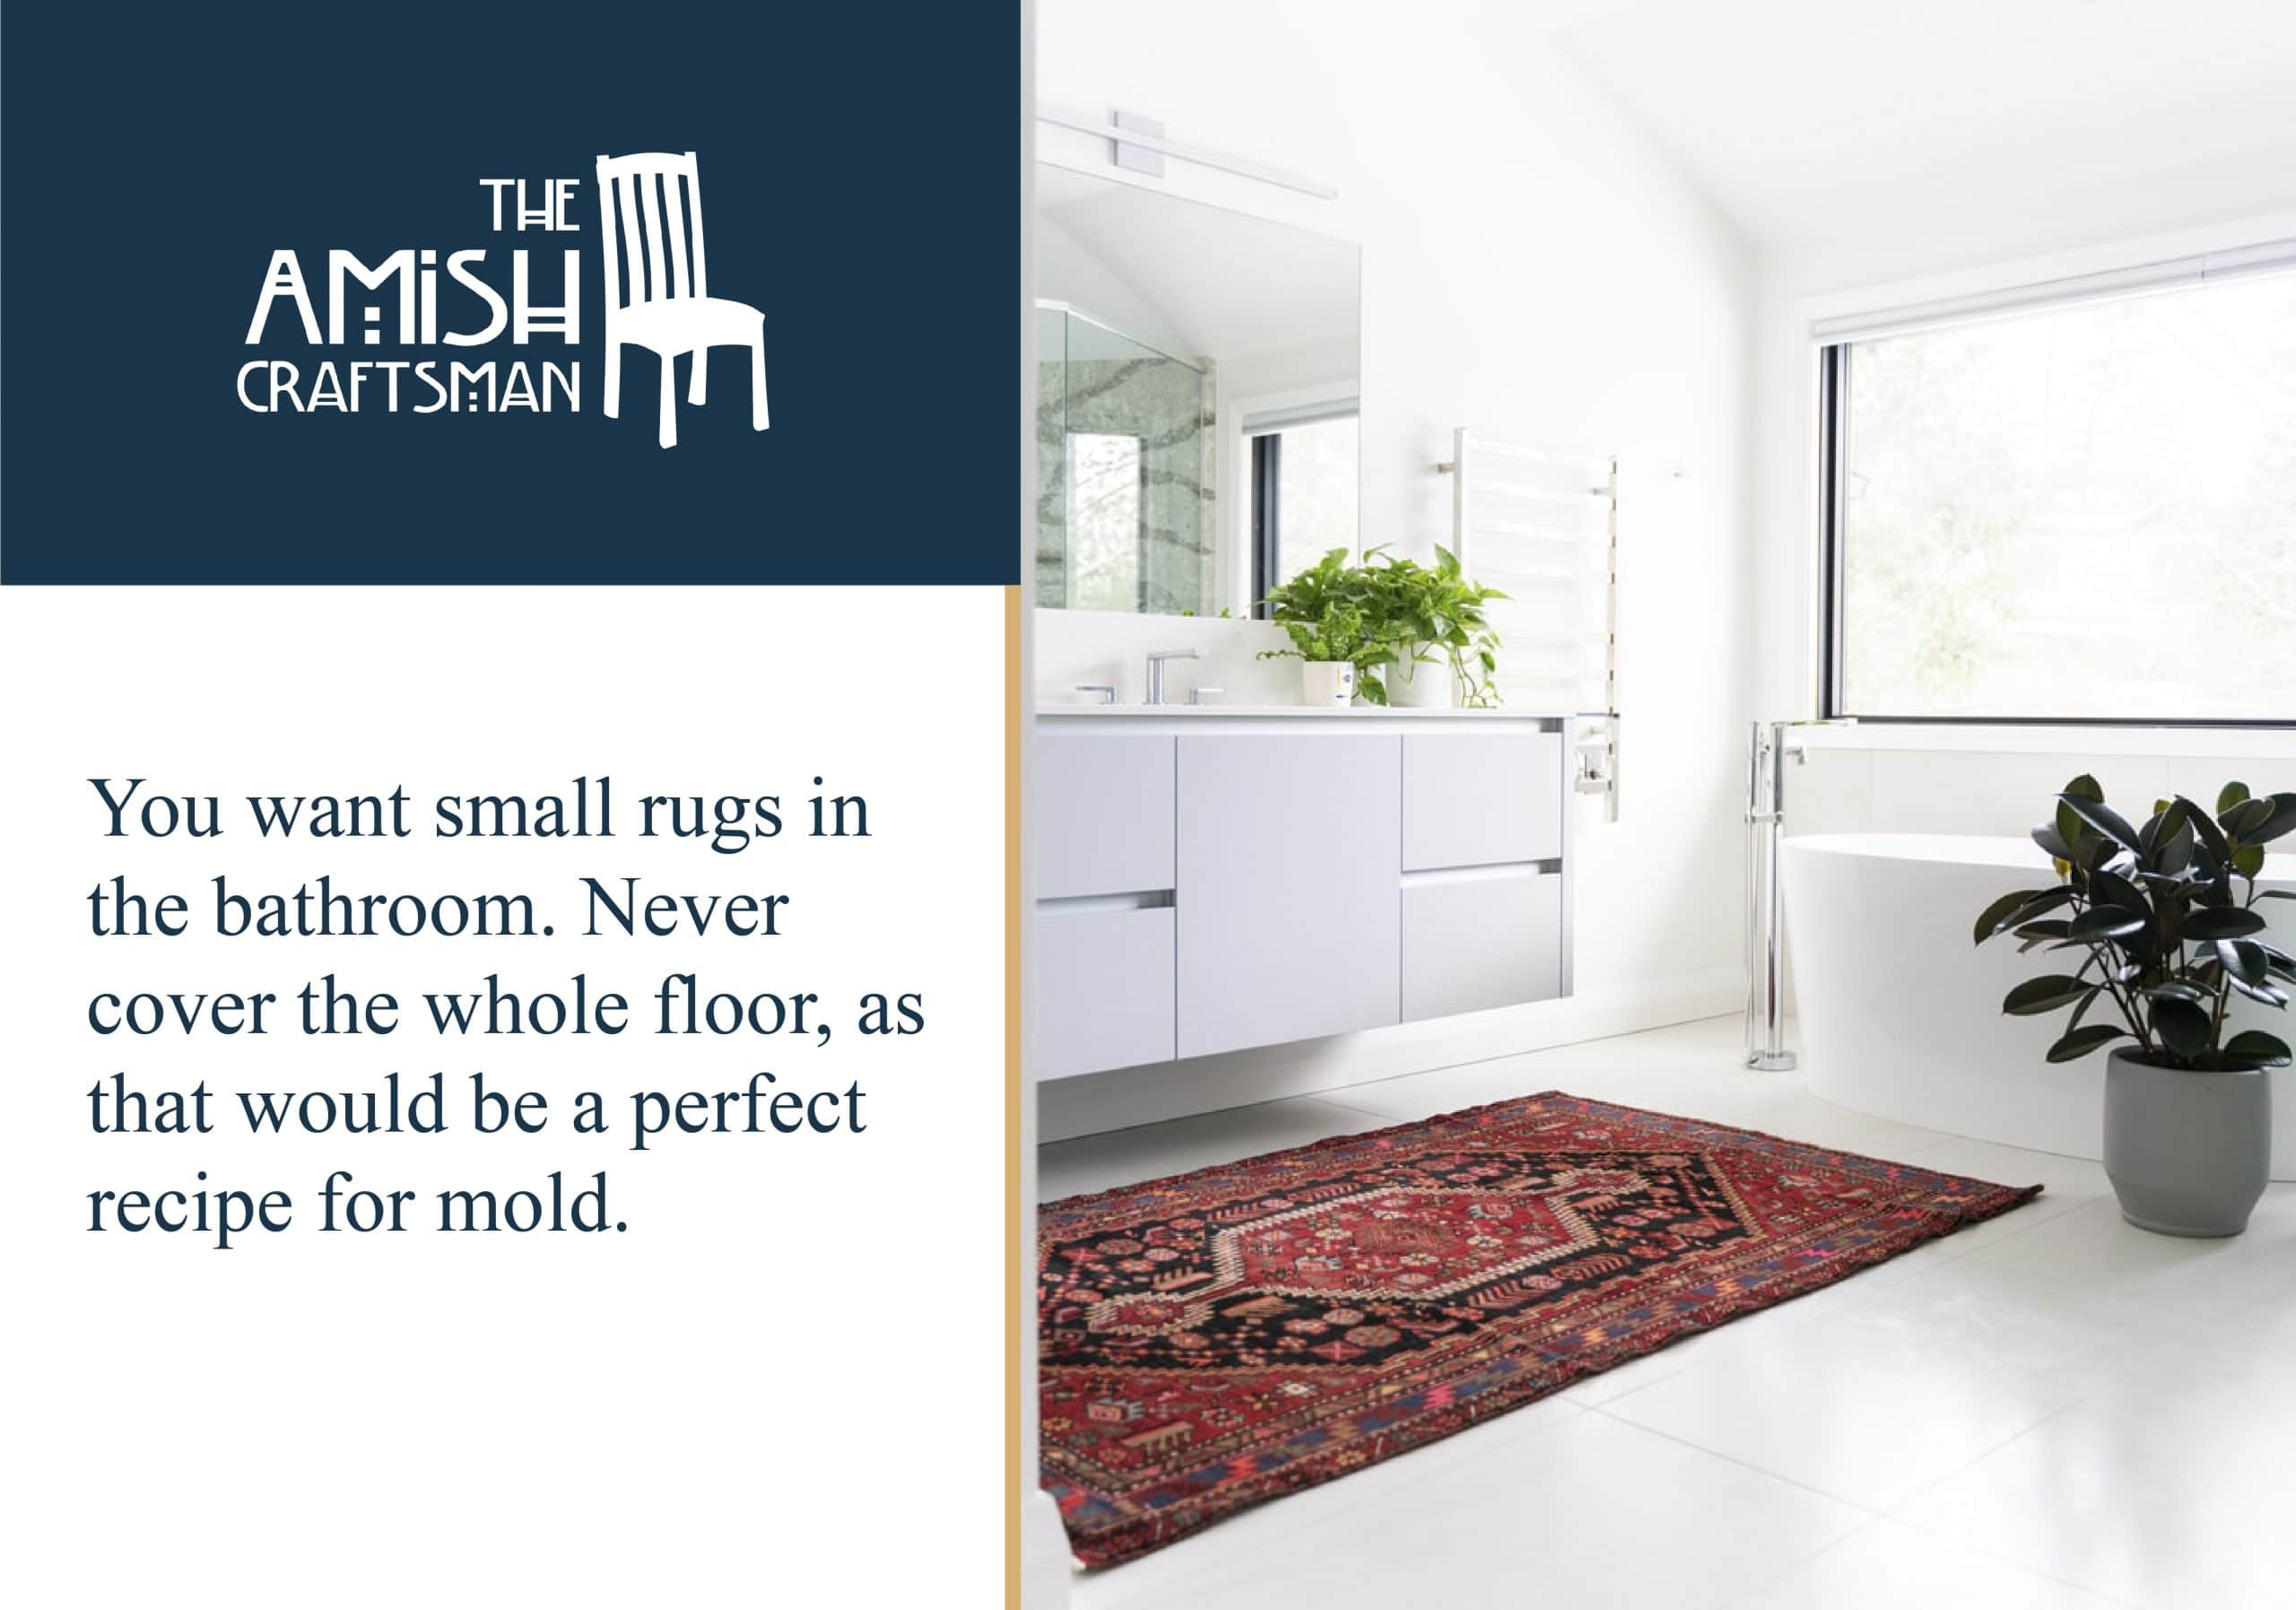 Small rugs work best in a bathroom